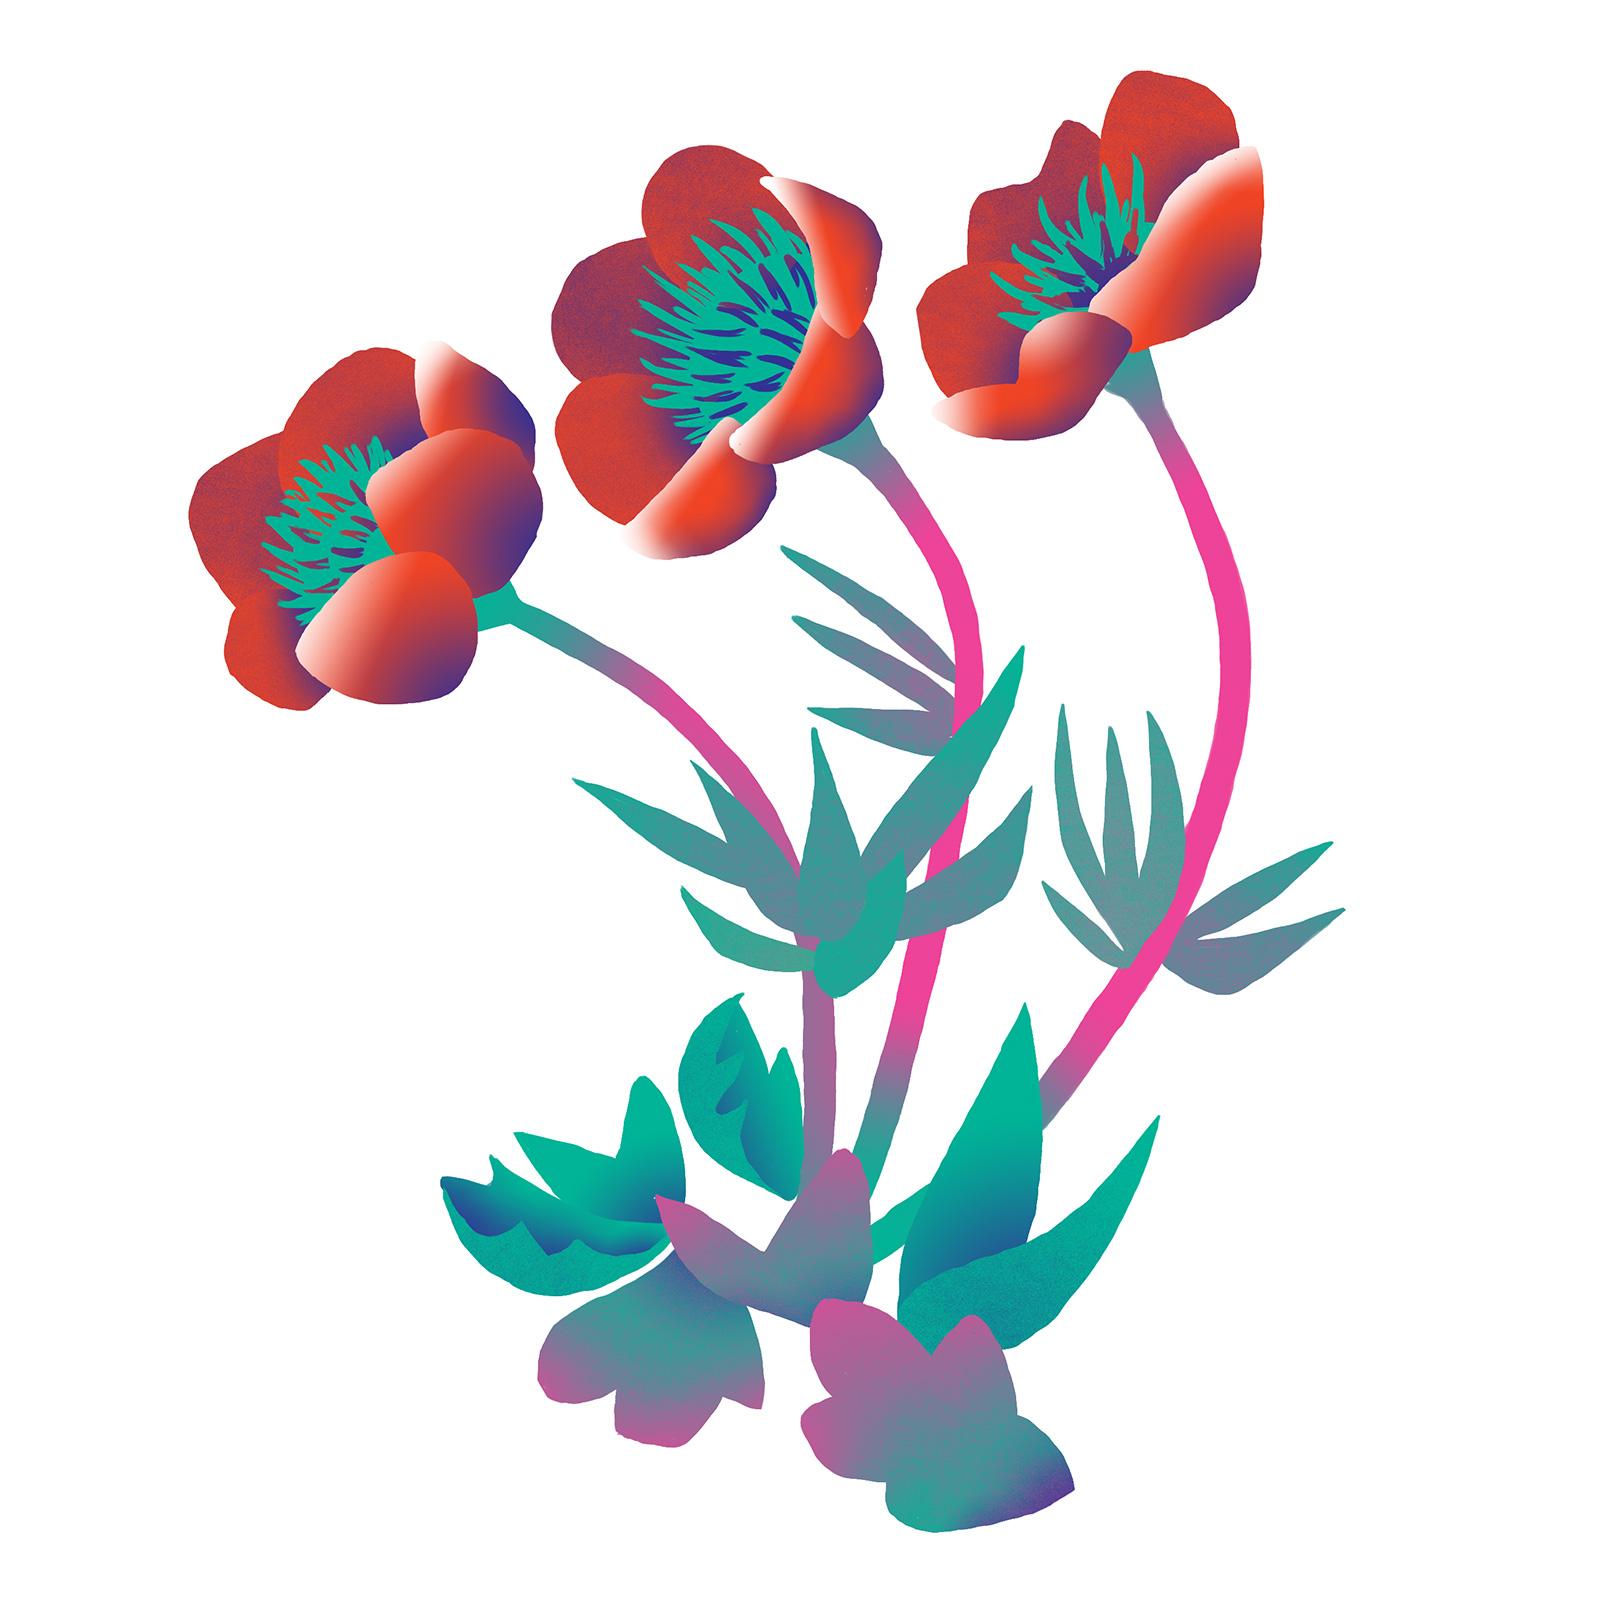 poppies-biomimicry-digital-illustration-by-Fiona-Dunnett.jpg